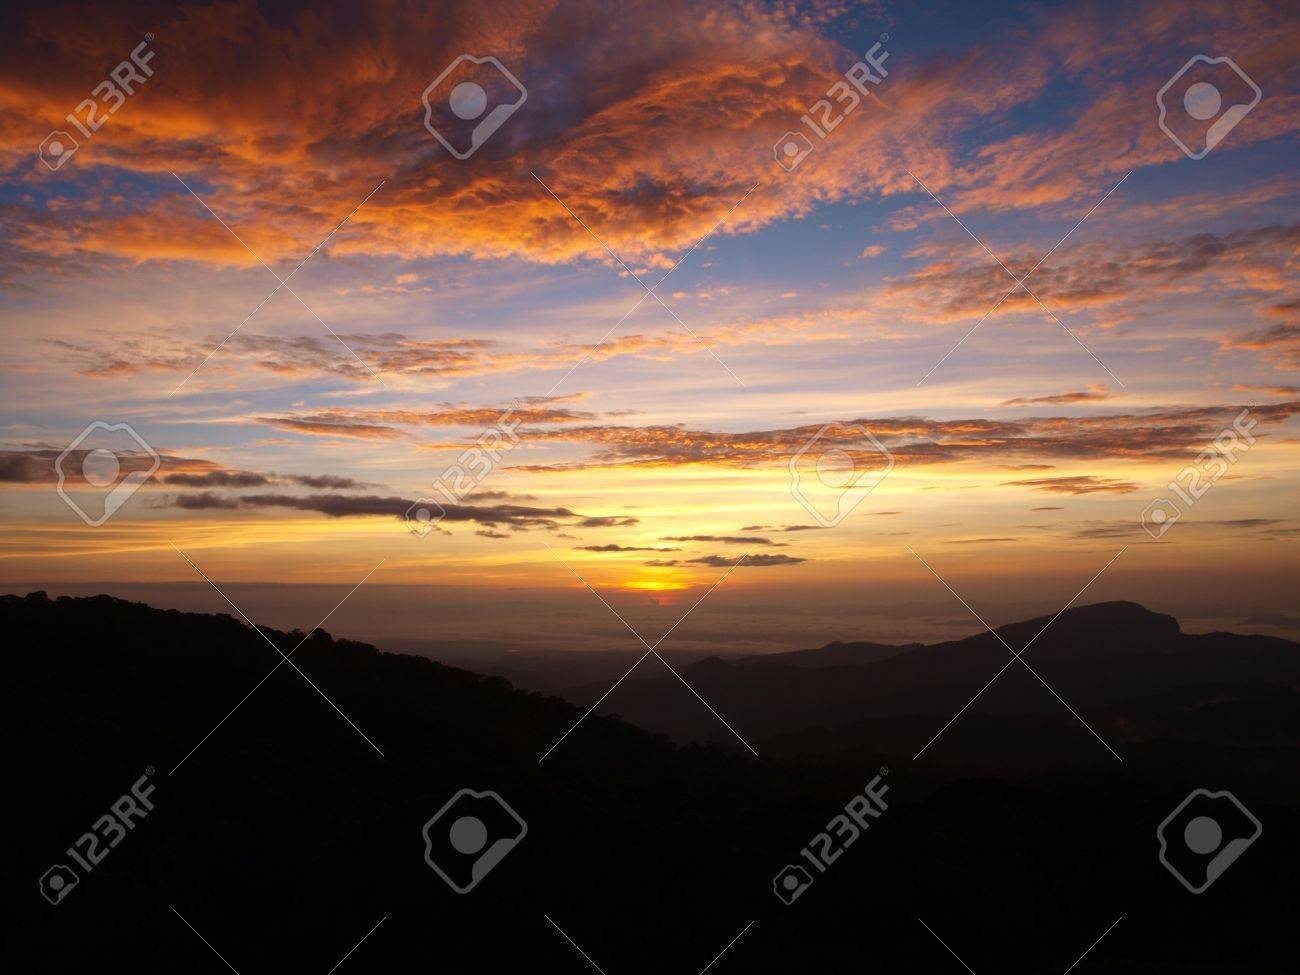 Sunset on Doi Inthanon mountain at Chiangmai Stock Photo - 10393117